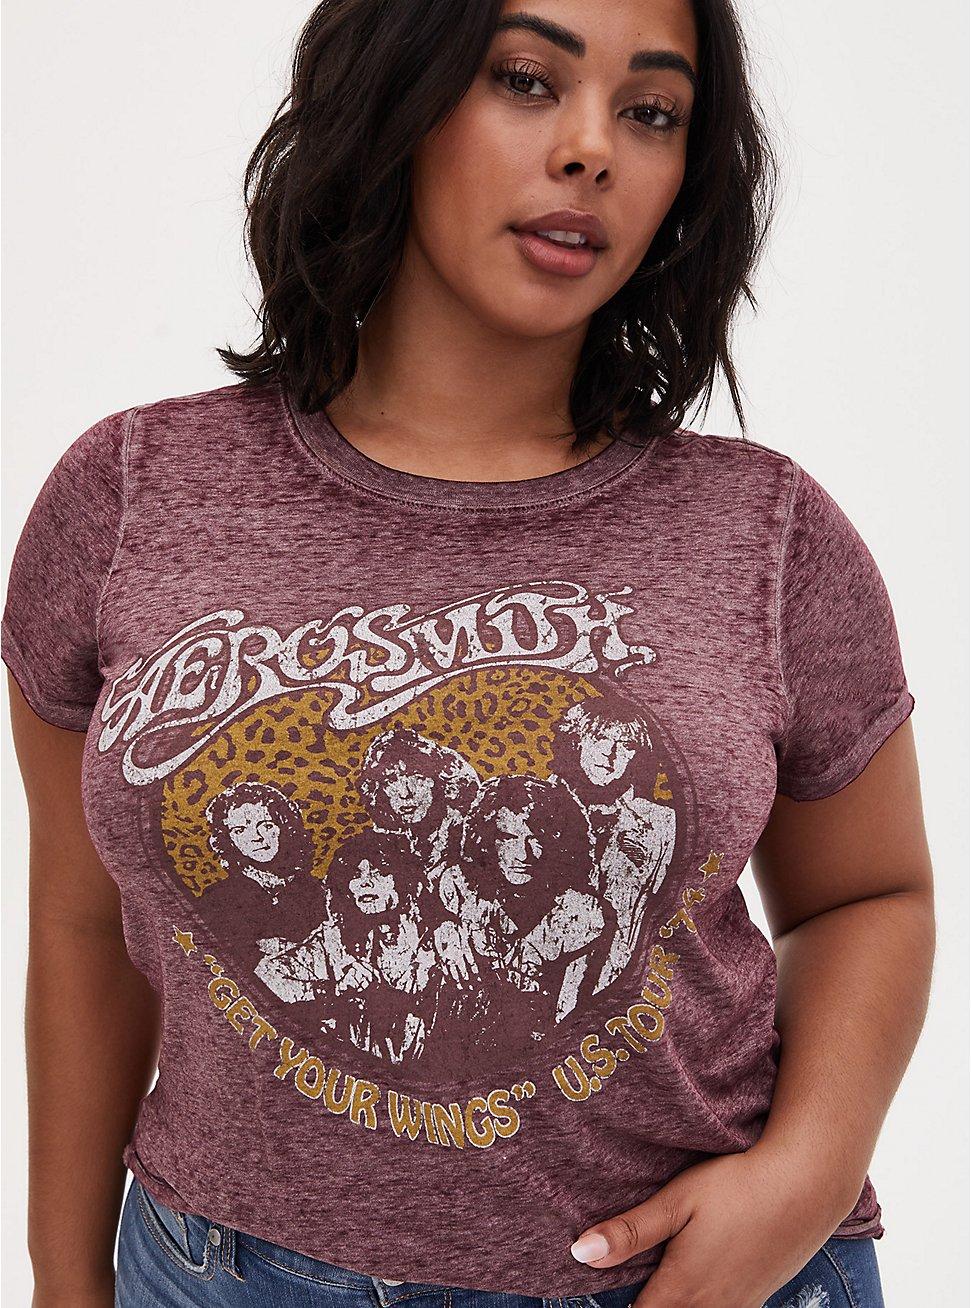 Aerosmith Burgundy Purple Burnout Crew Tee, WINETASTING, hi-res